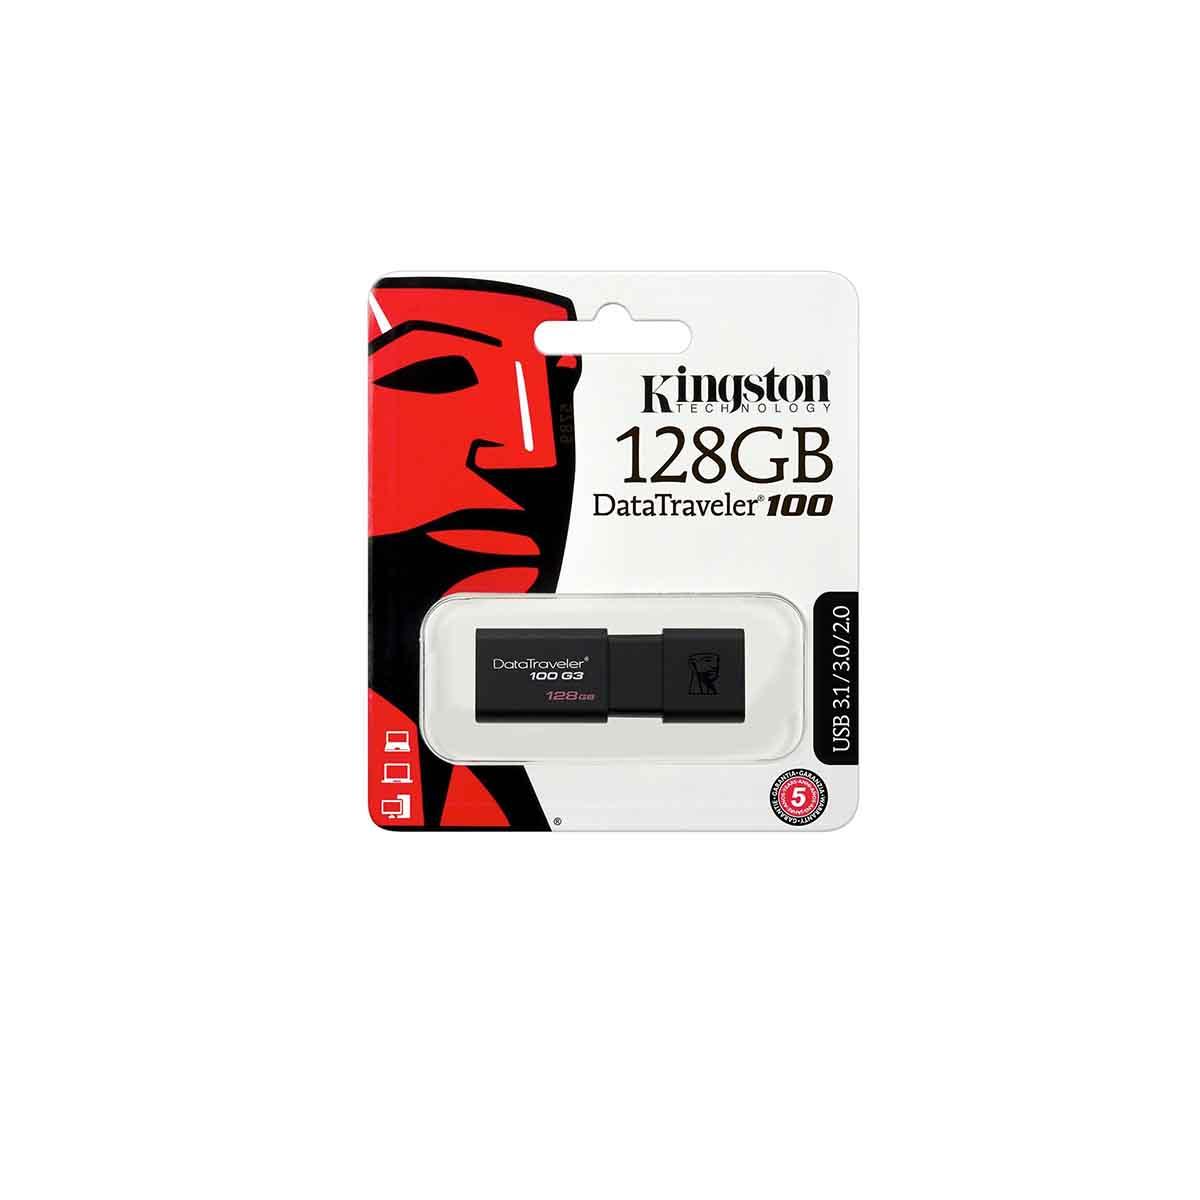 Pendrive Kingston 128GB USB Data Traveler 100G3 DTI1000G3/128GB